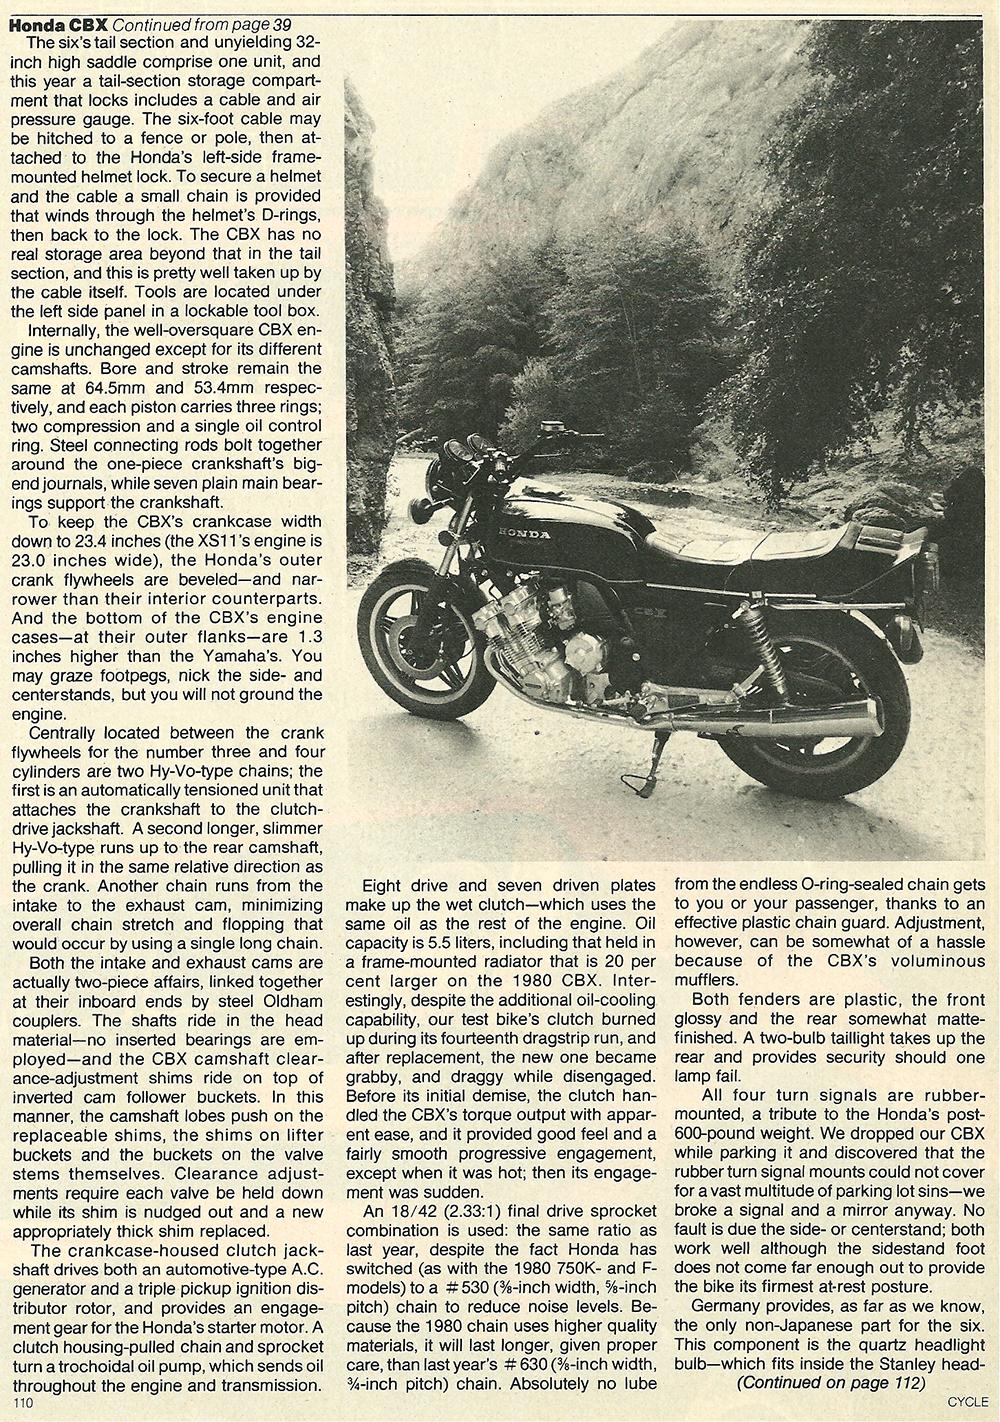 1979 Honda CBX road test 08.jpg